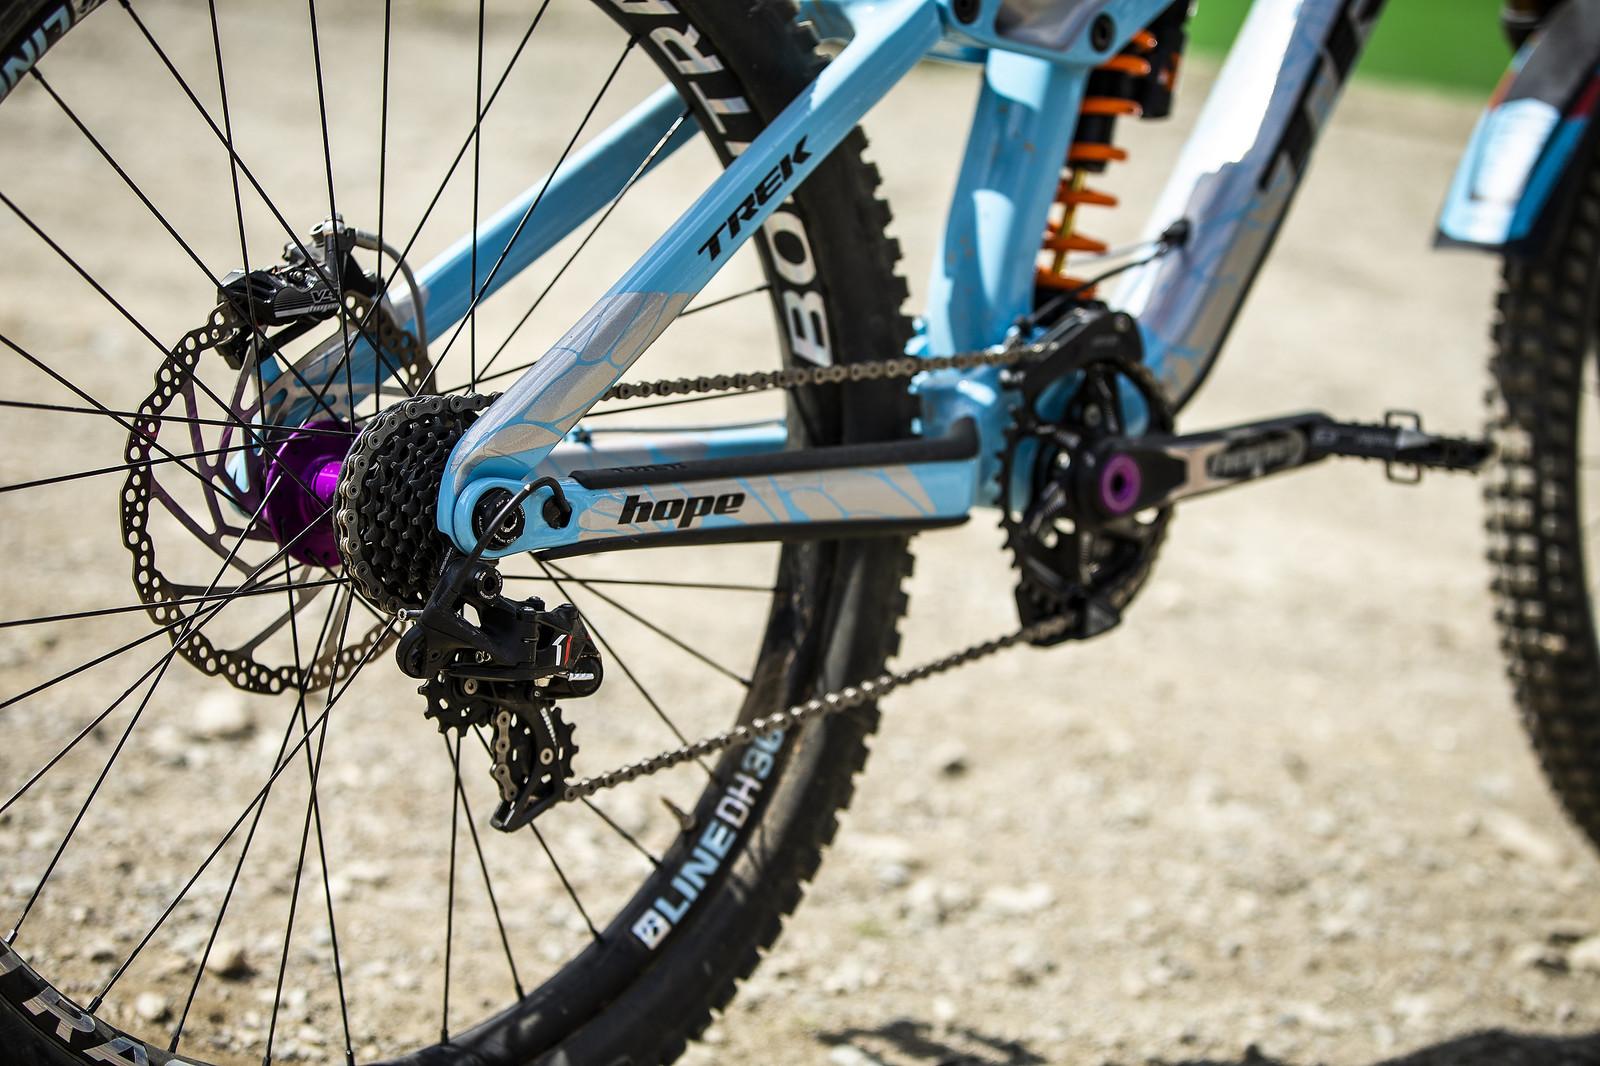 SRAM X0 DH Derailleur and Cassette - WINNING BIKE - Rachel Atherton's Trek Session - Mountain Biking Pictures - Vital MTB